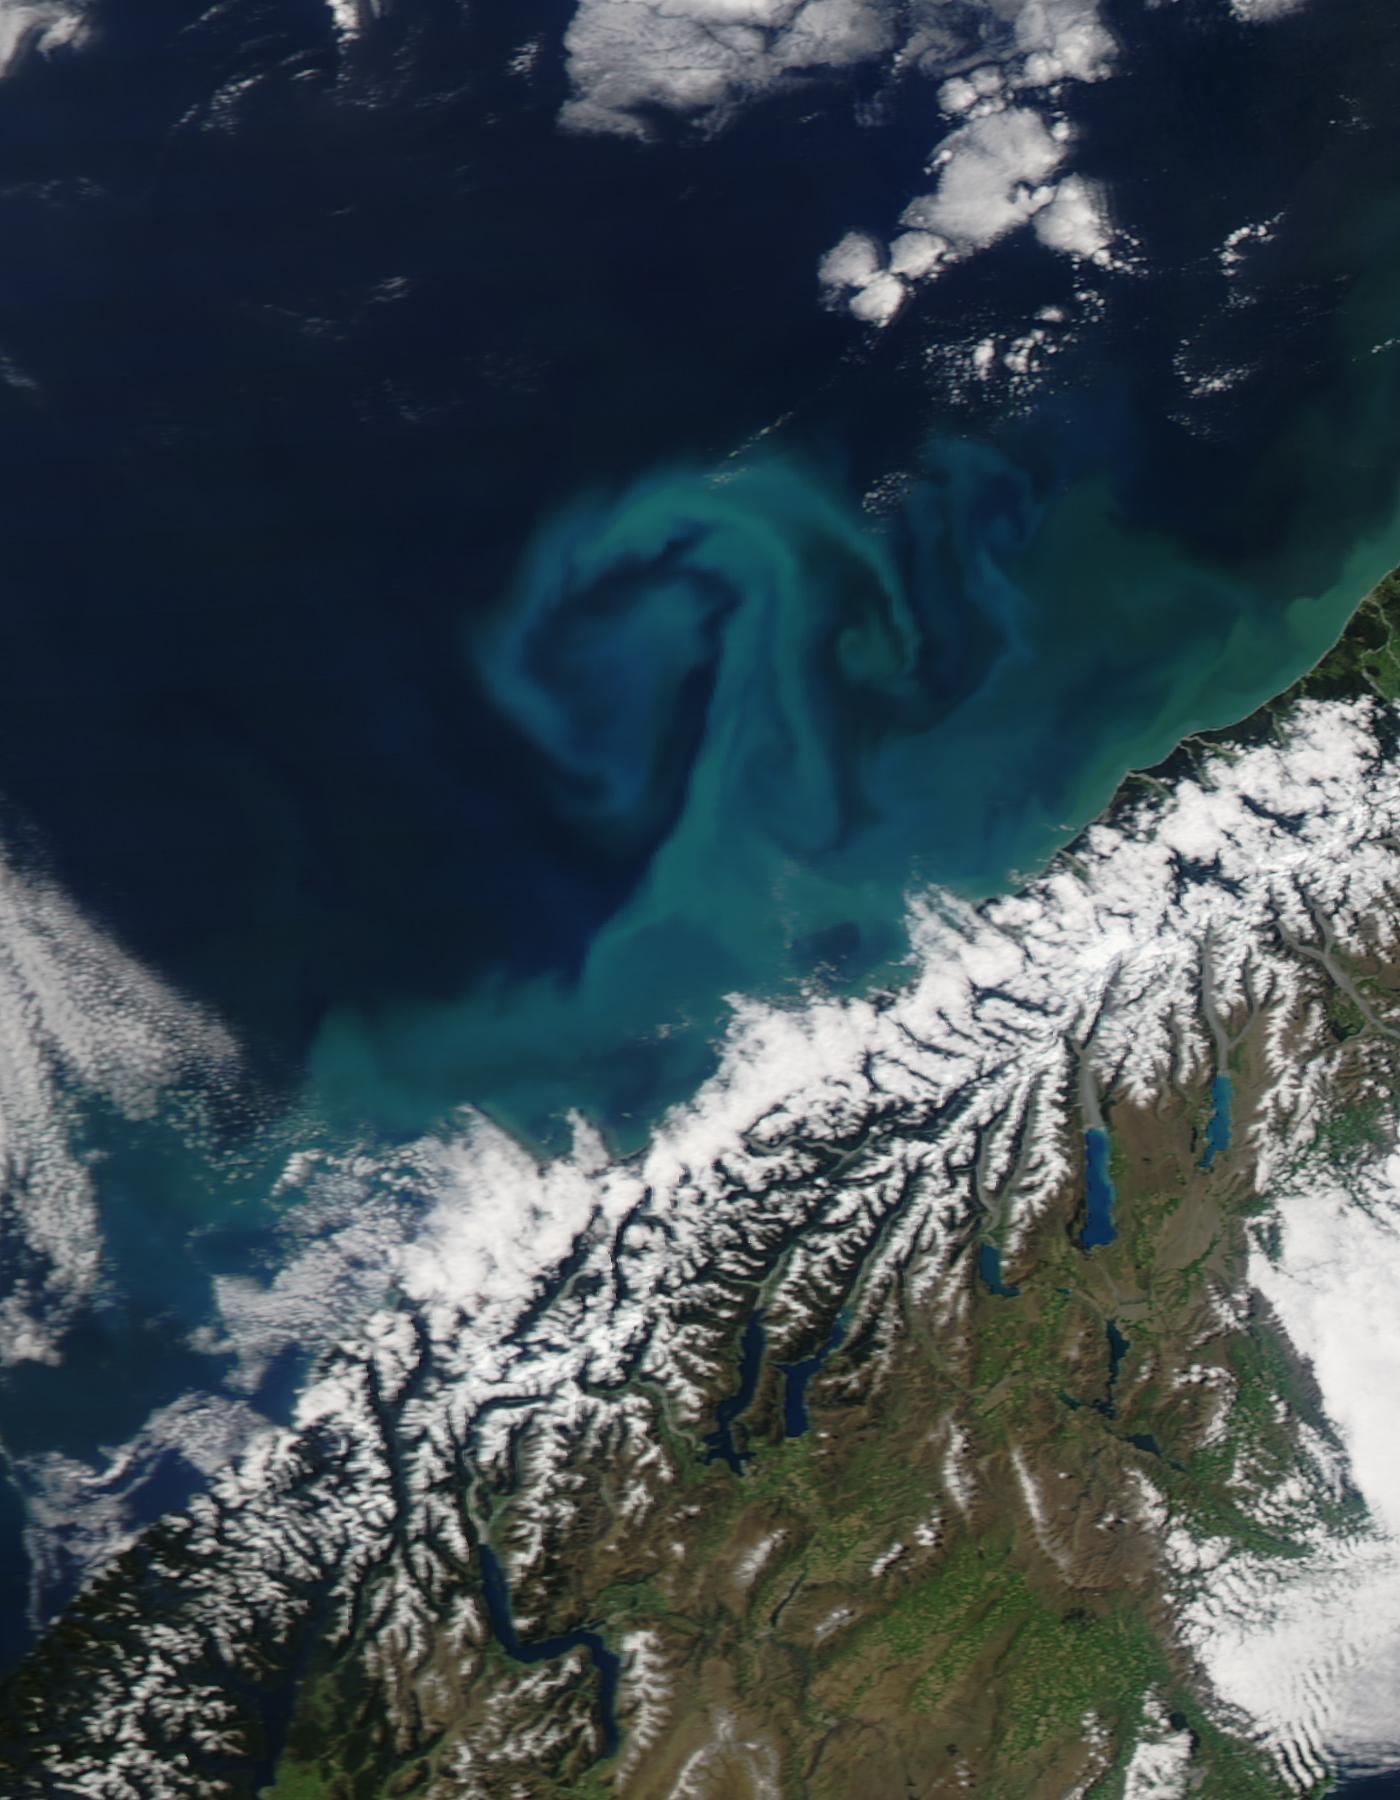 Algal bloom off New Zealand coast